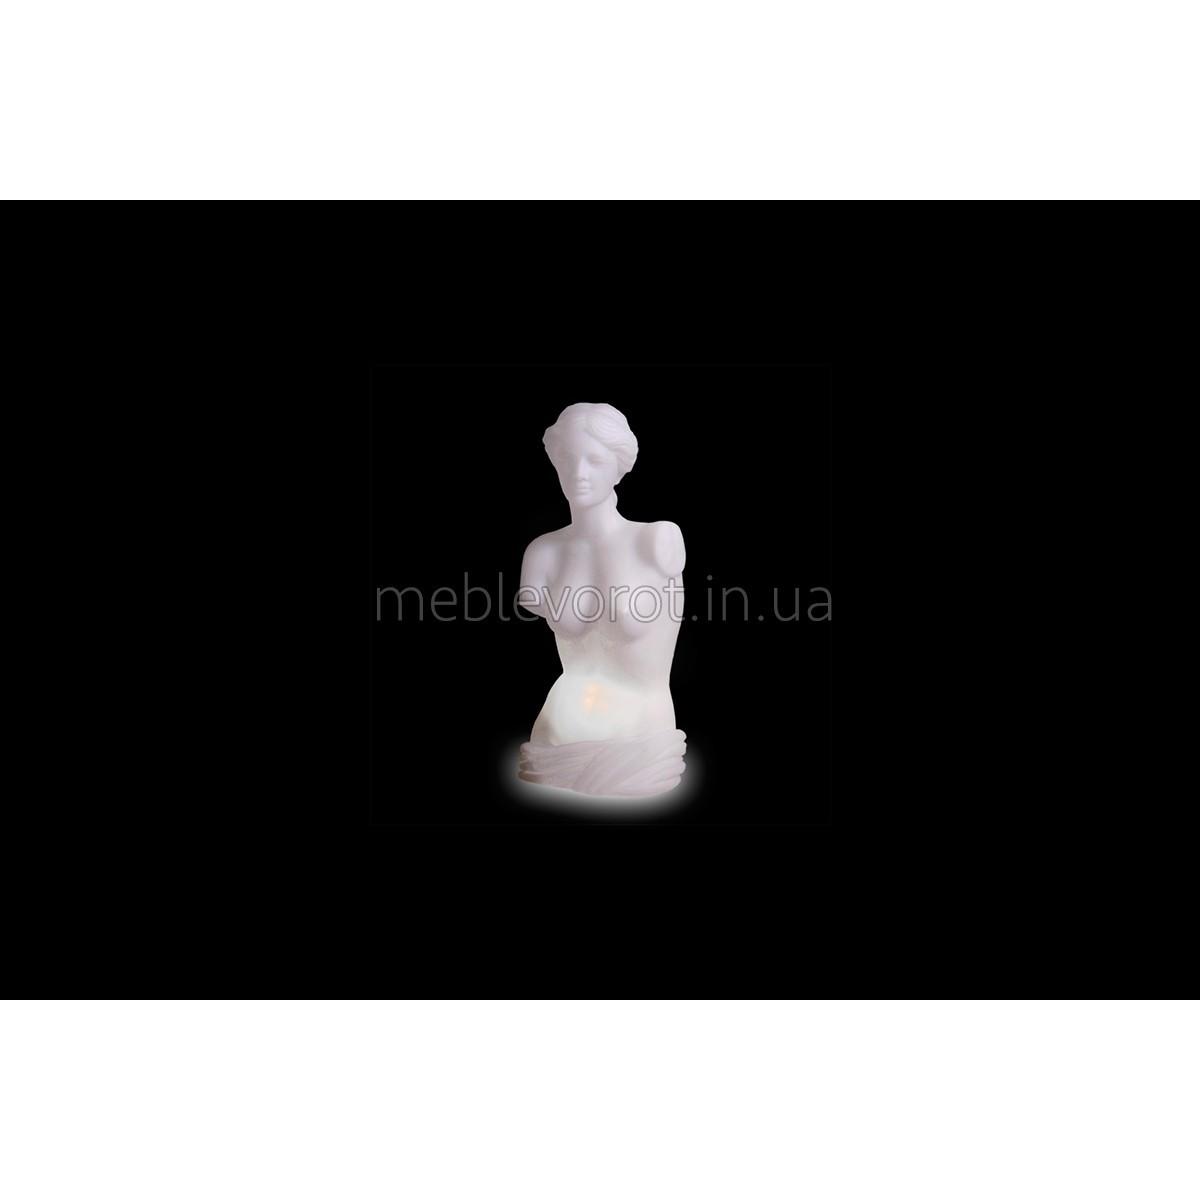 LED Бюст Венеры (Аренда)